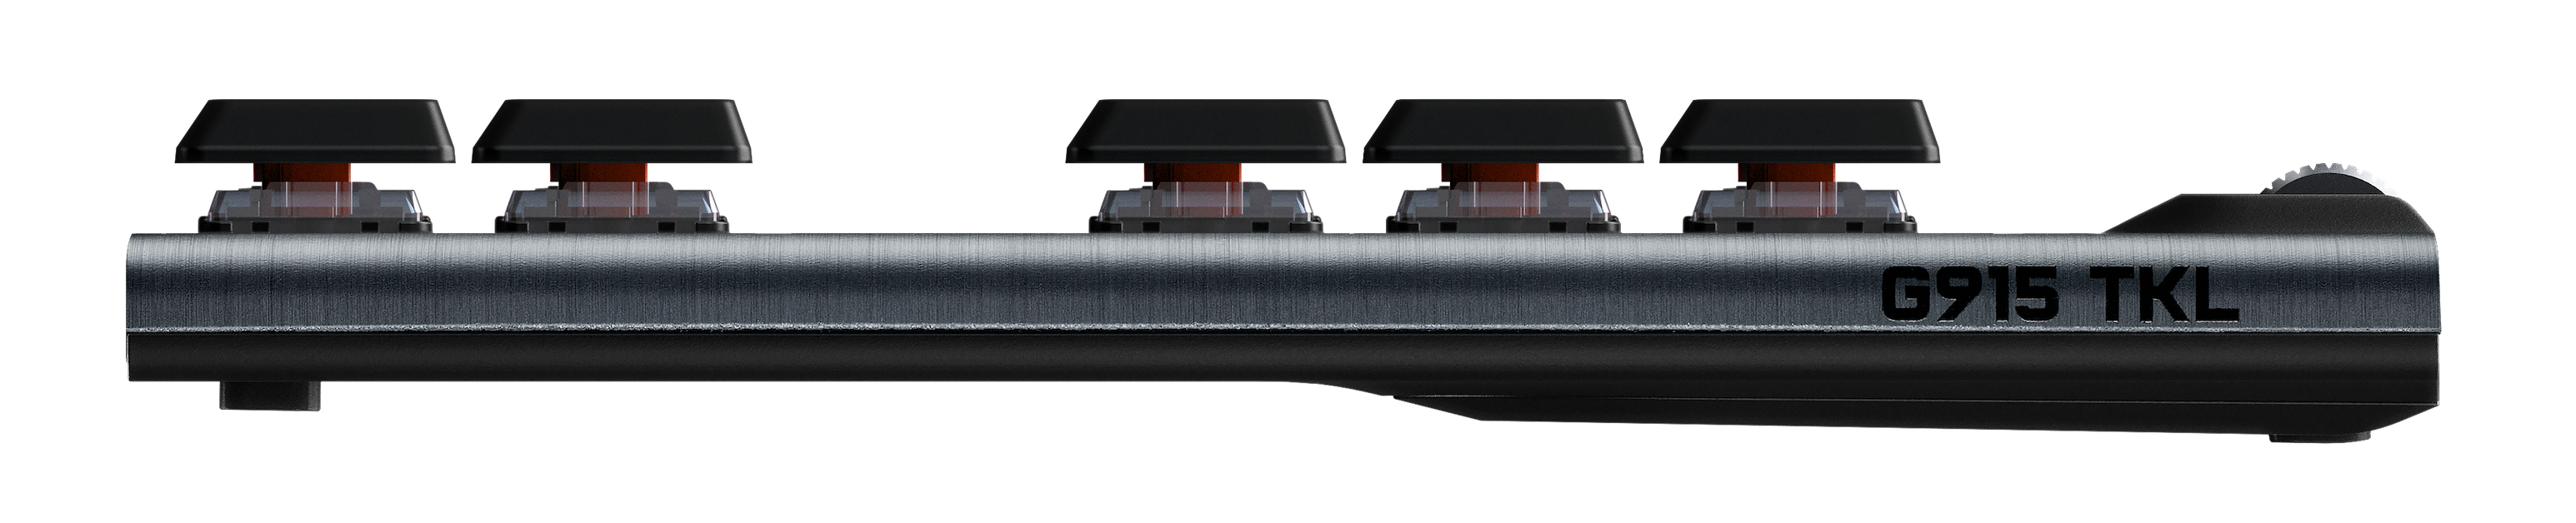 Logitech G915 Tenkeyless Lightspeed Wireless RGB